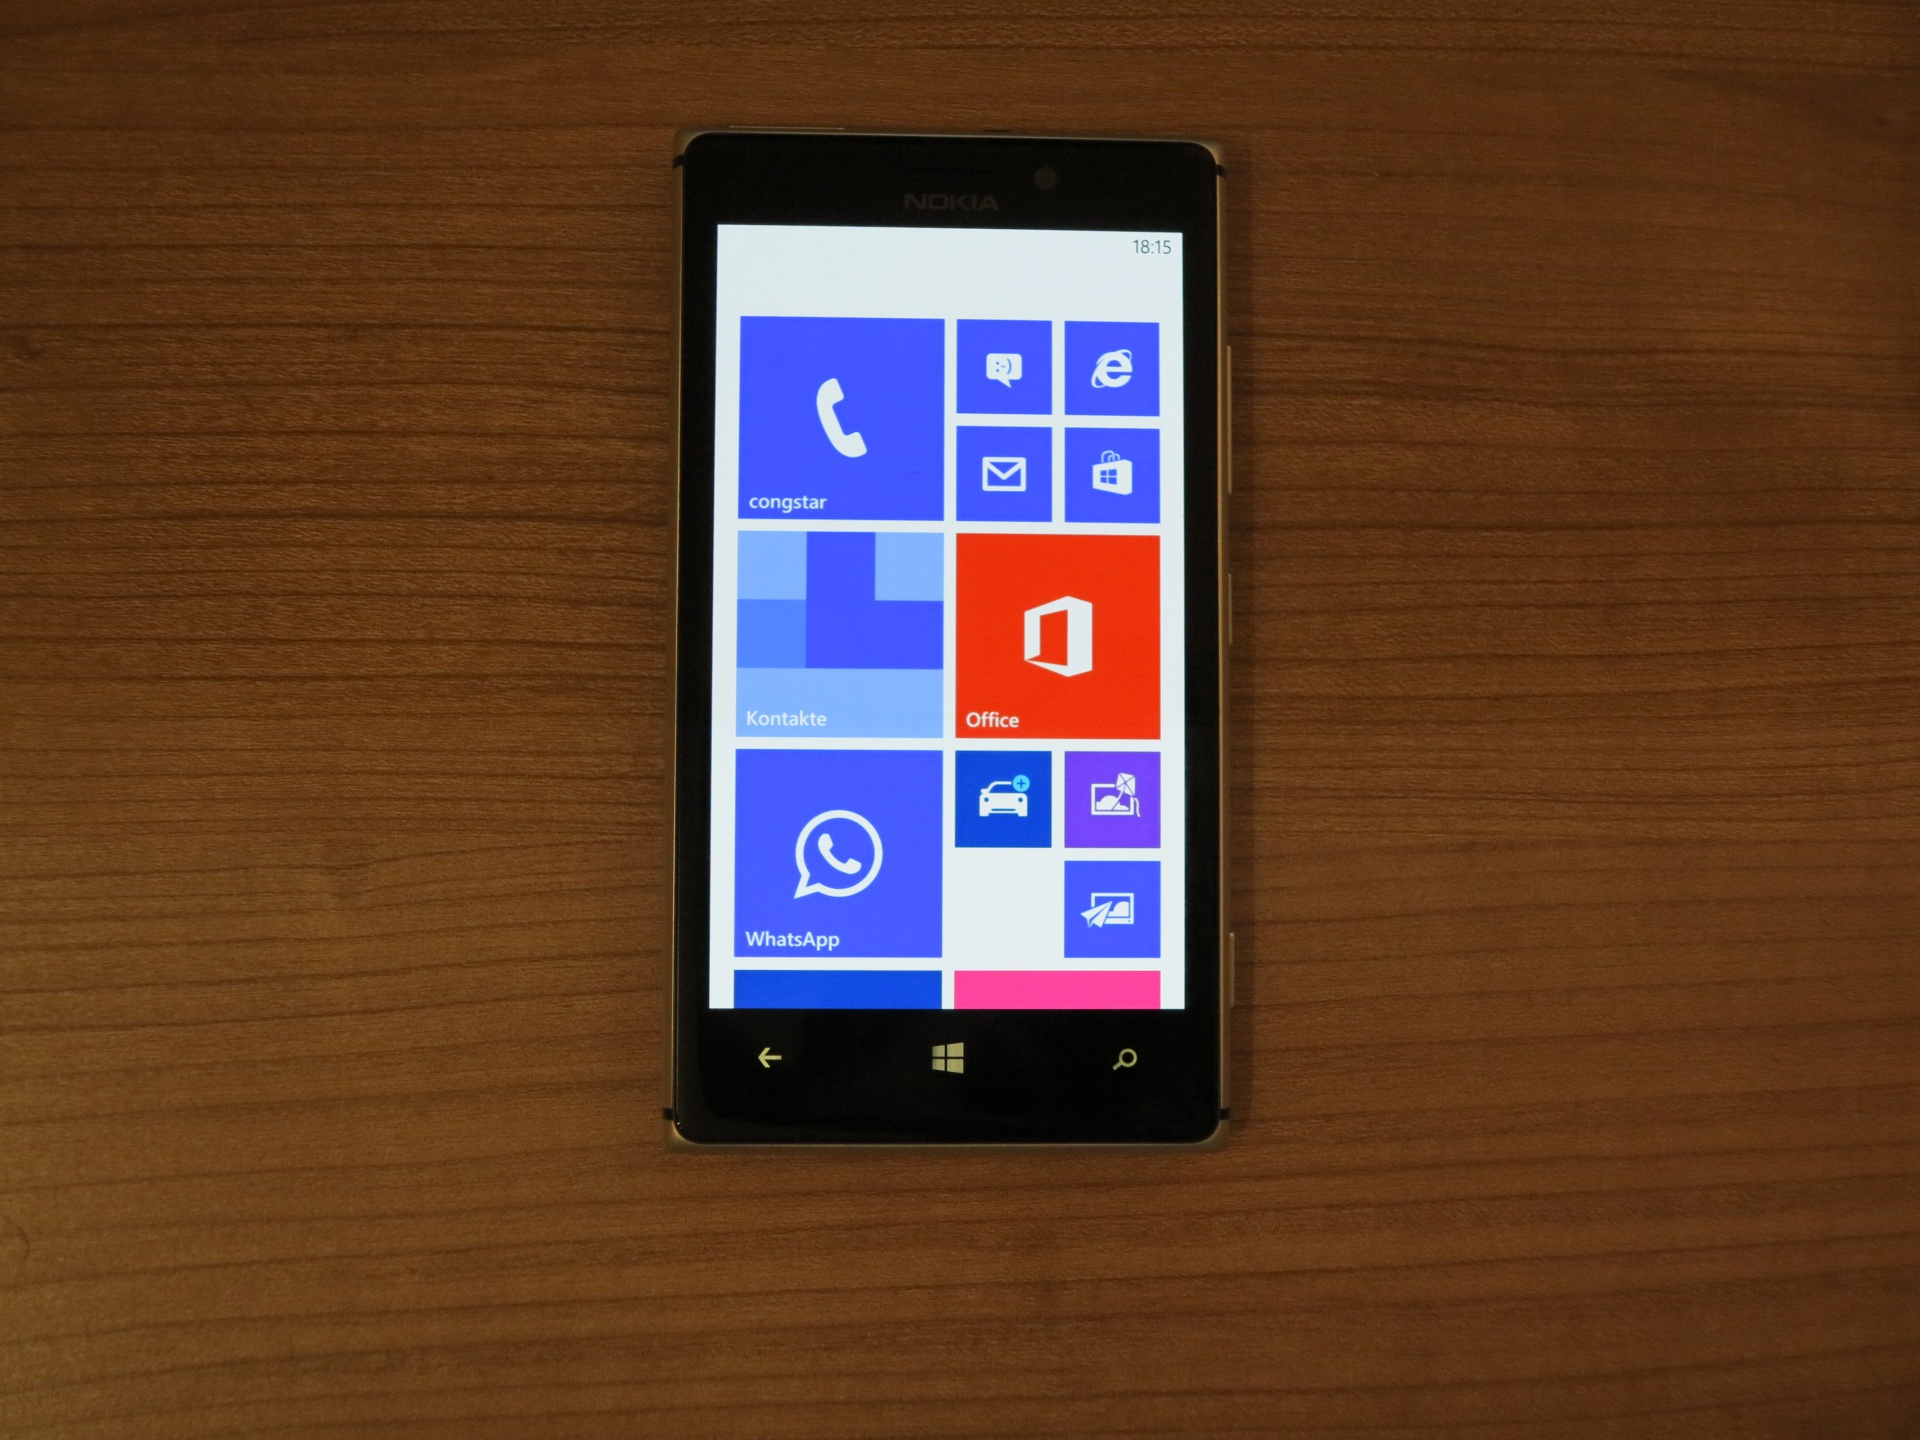 Nokia lumia 925 jpg - Filename Nokia Lumia 925 Windows Phone 1 Jpg